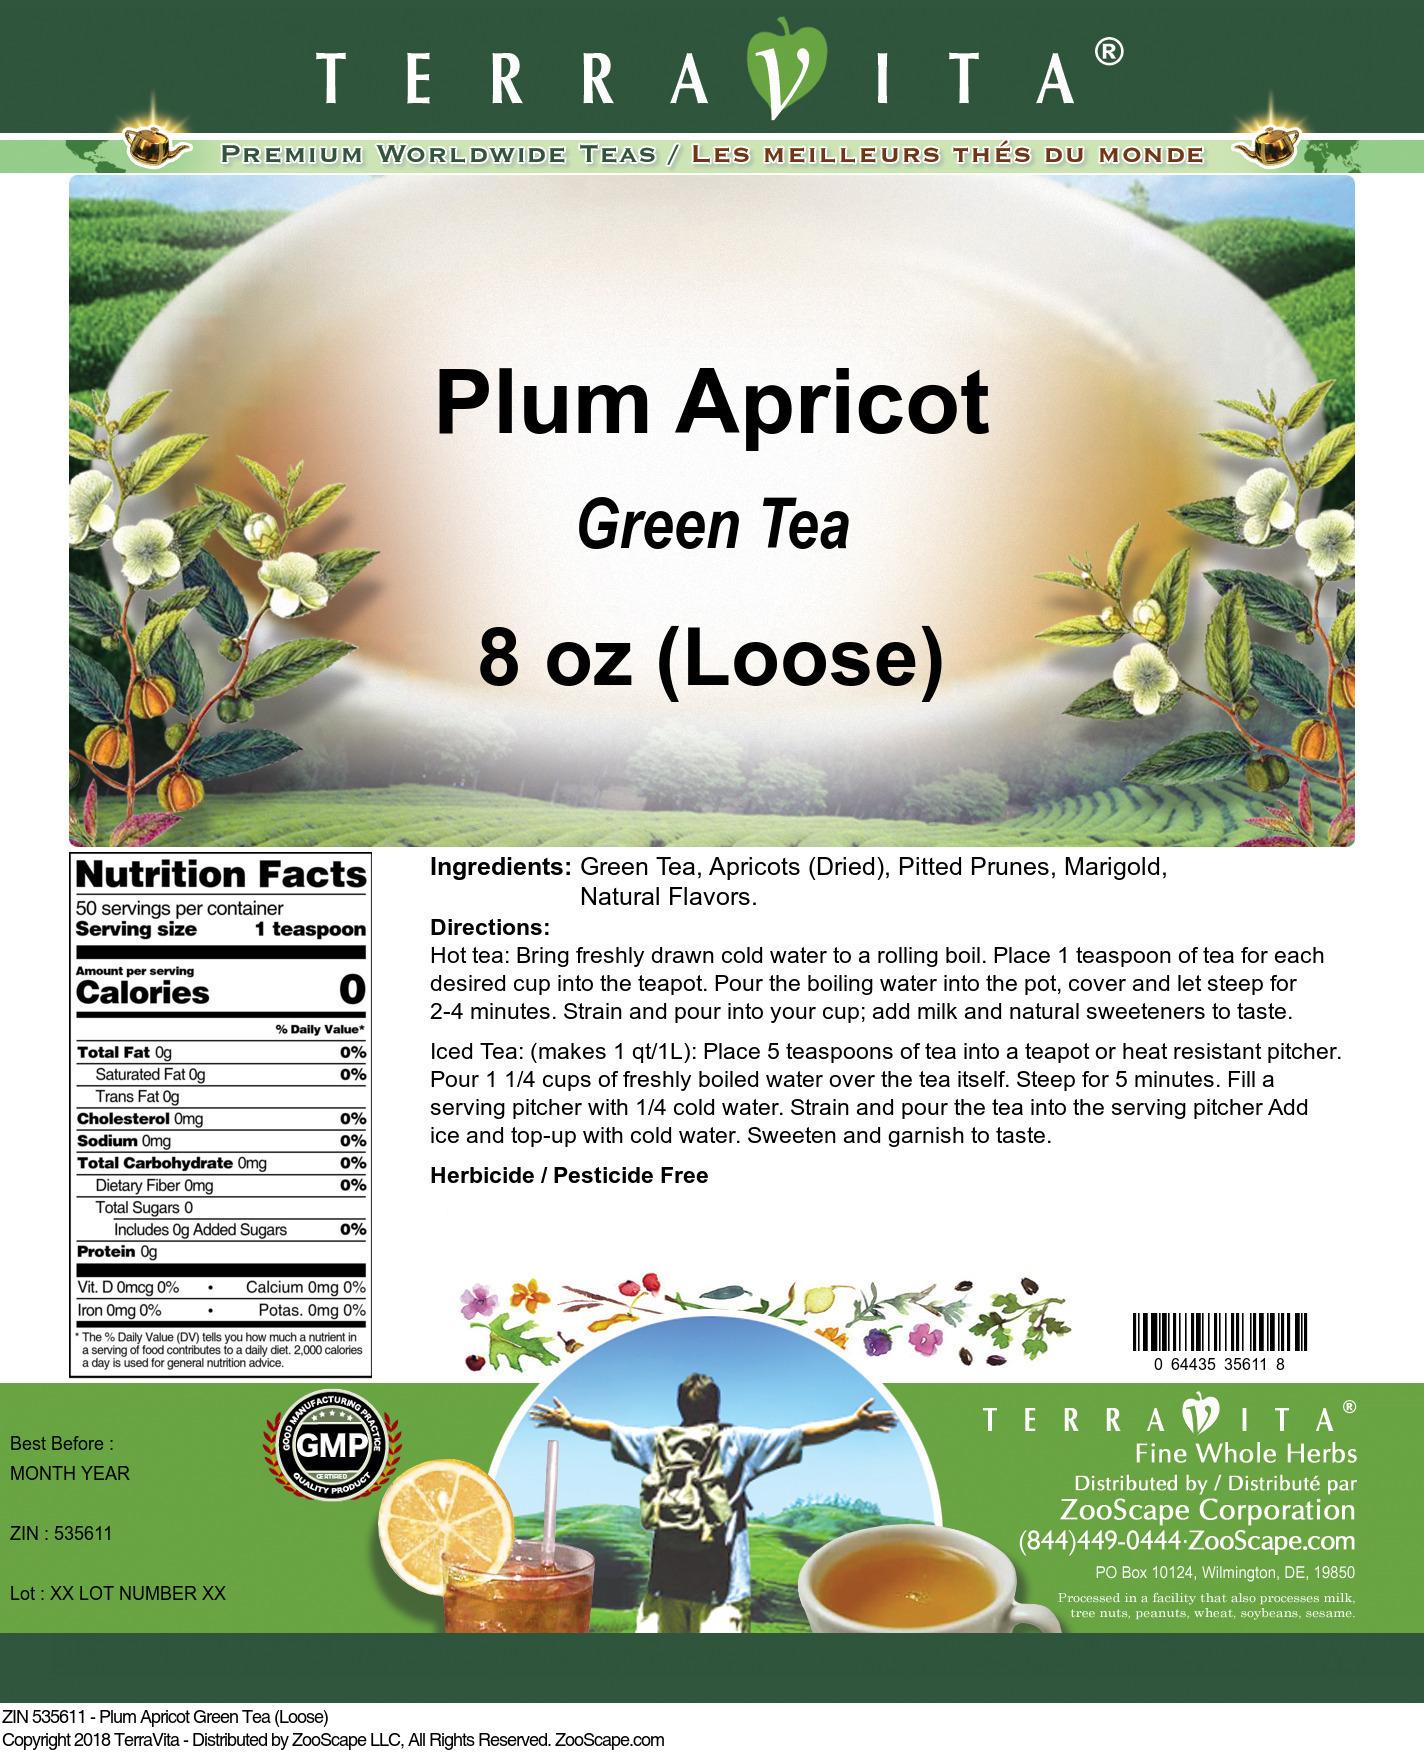 Plum Apricot Green Tea